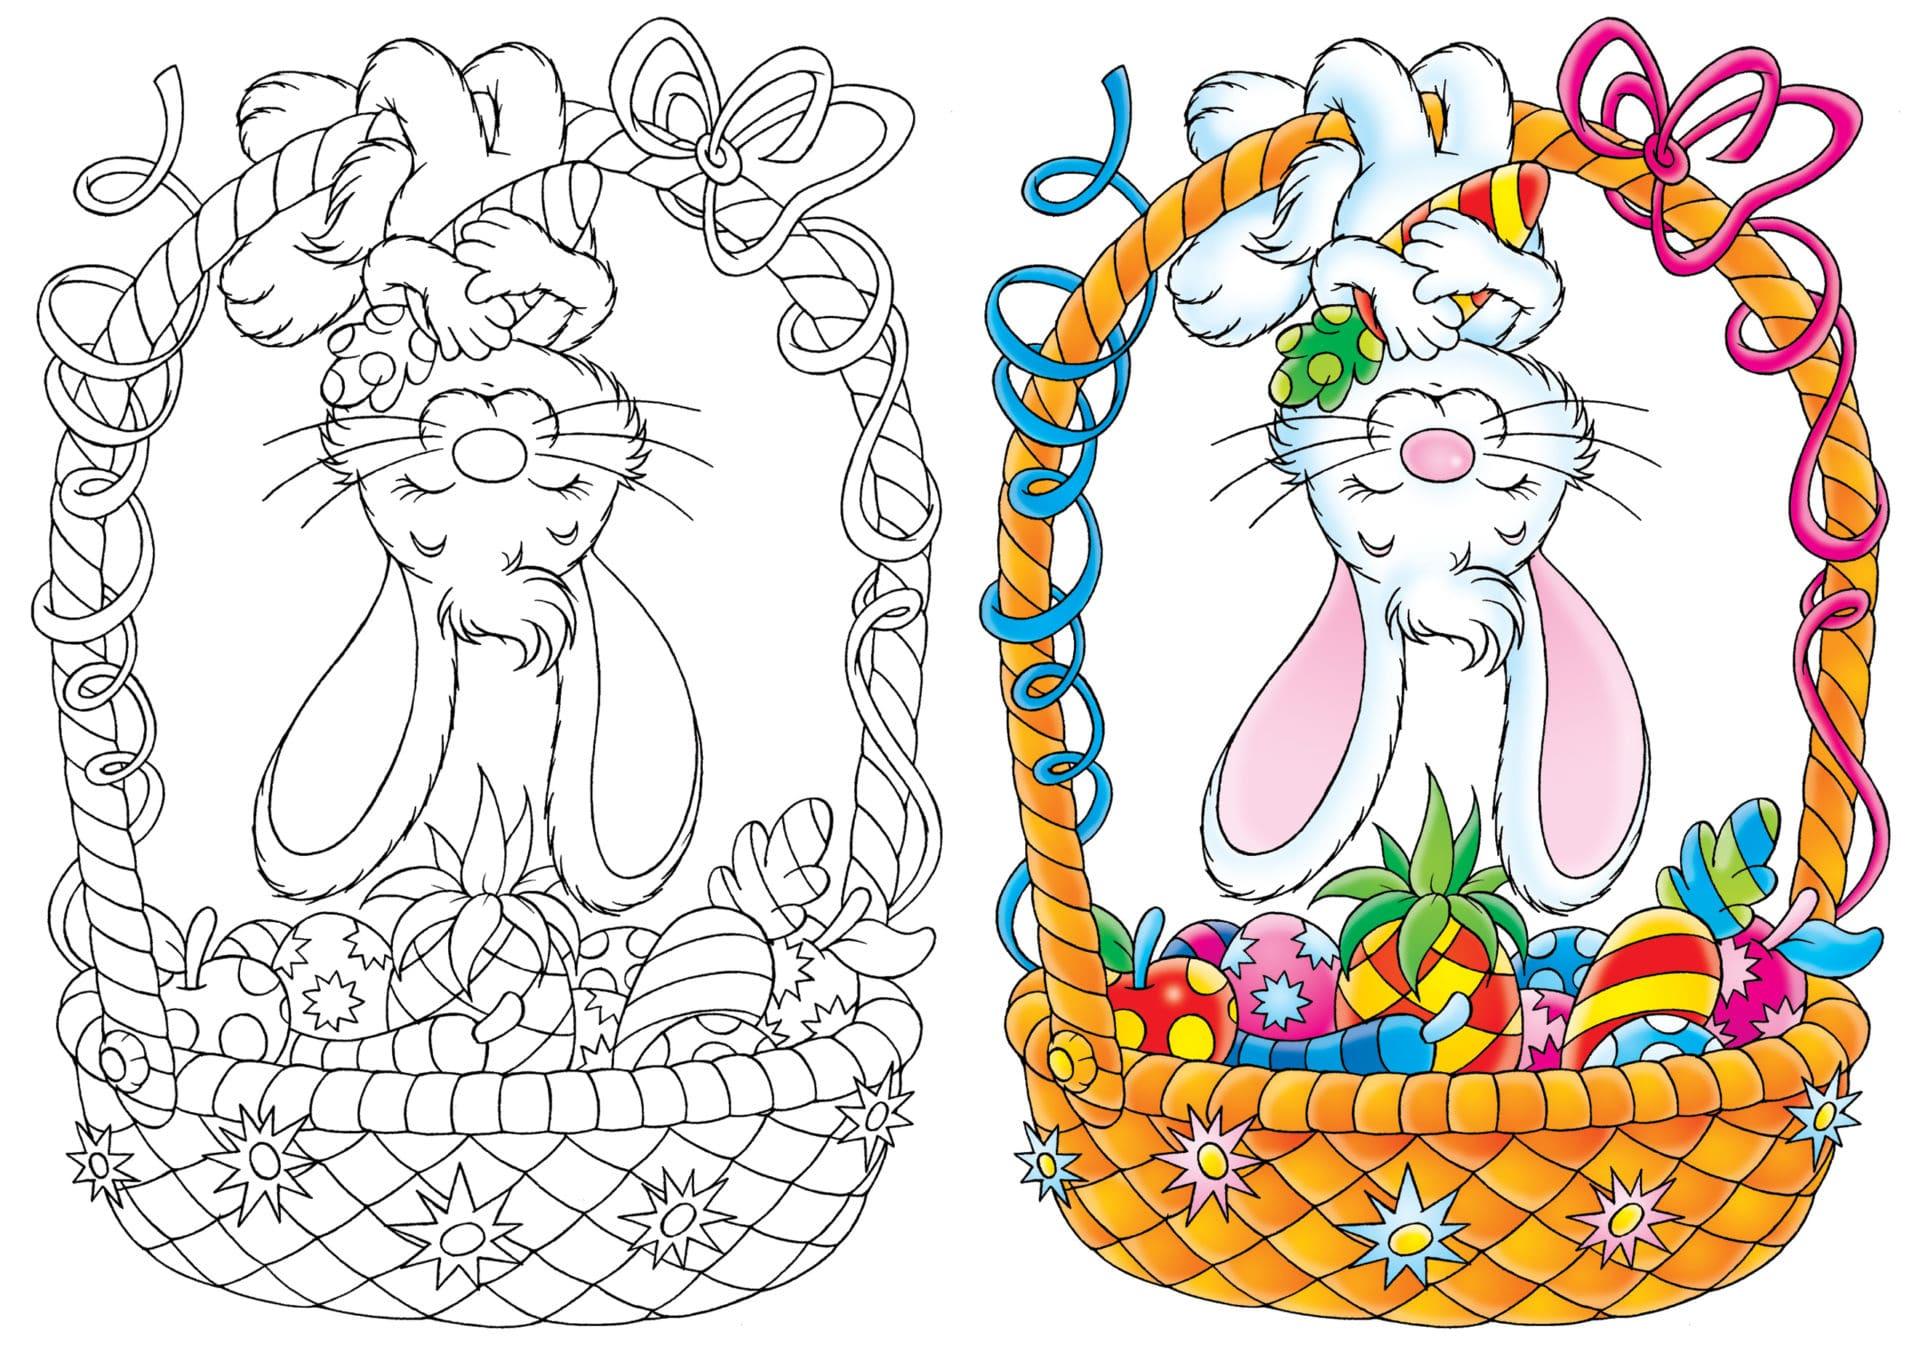 Coloriage Dessin Paques Imprimer.Pinterest Coloriages De Paques Gratuits A Imprimer